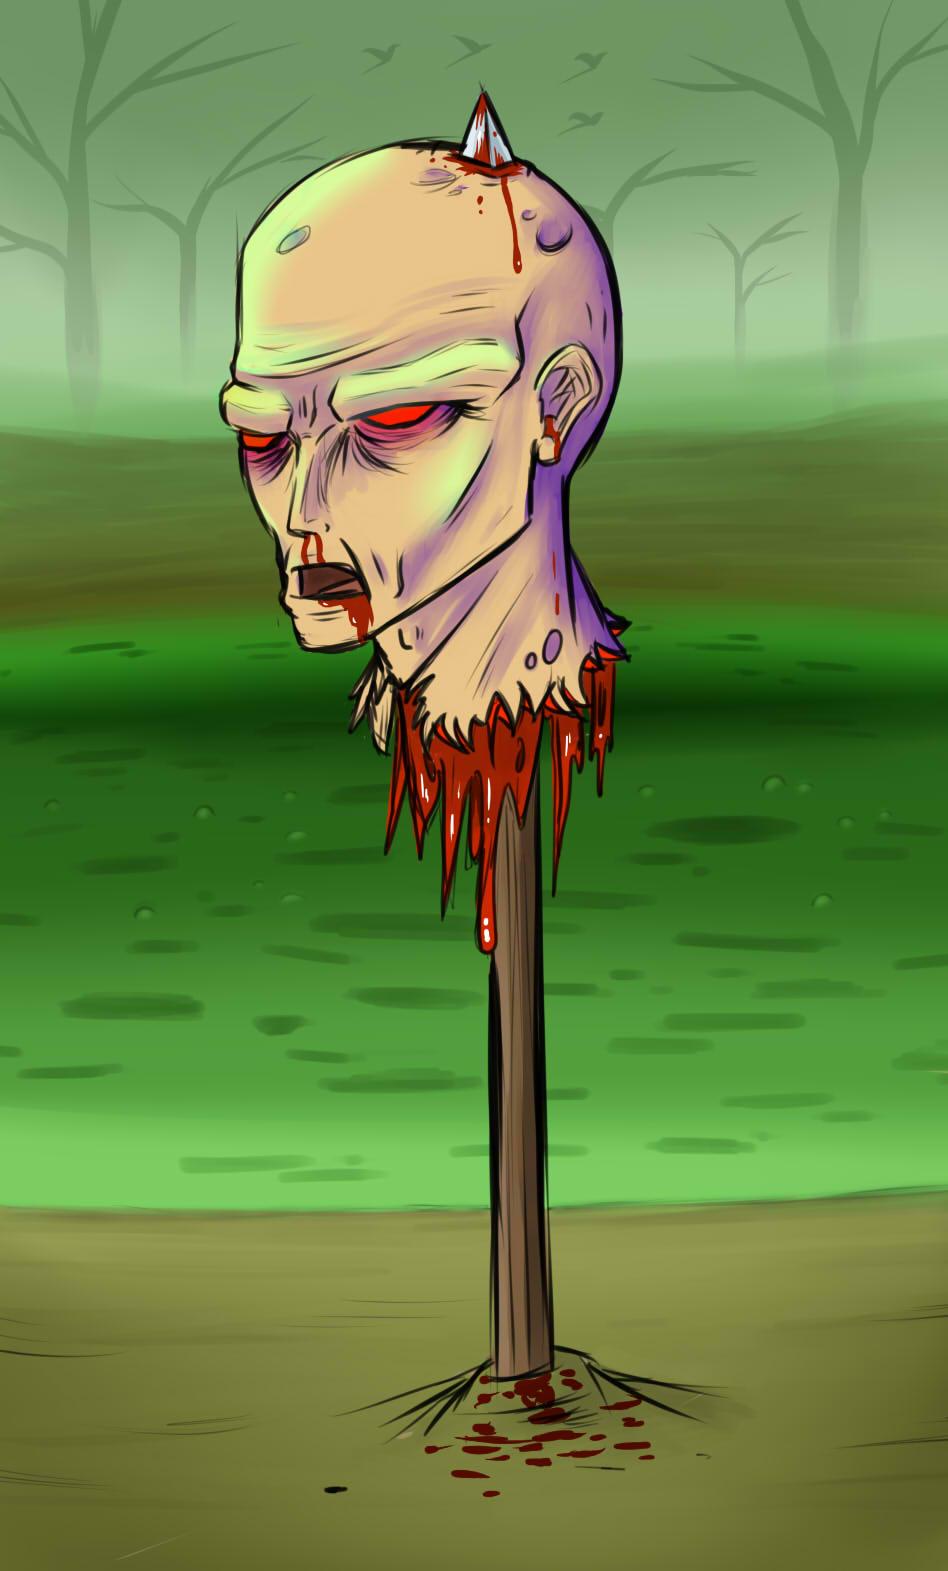 Zombie Head-on-a-stick